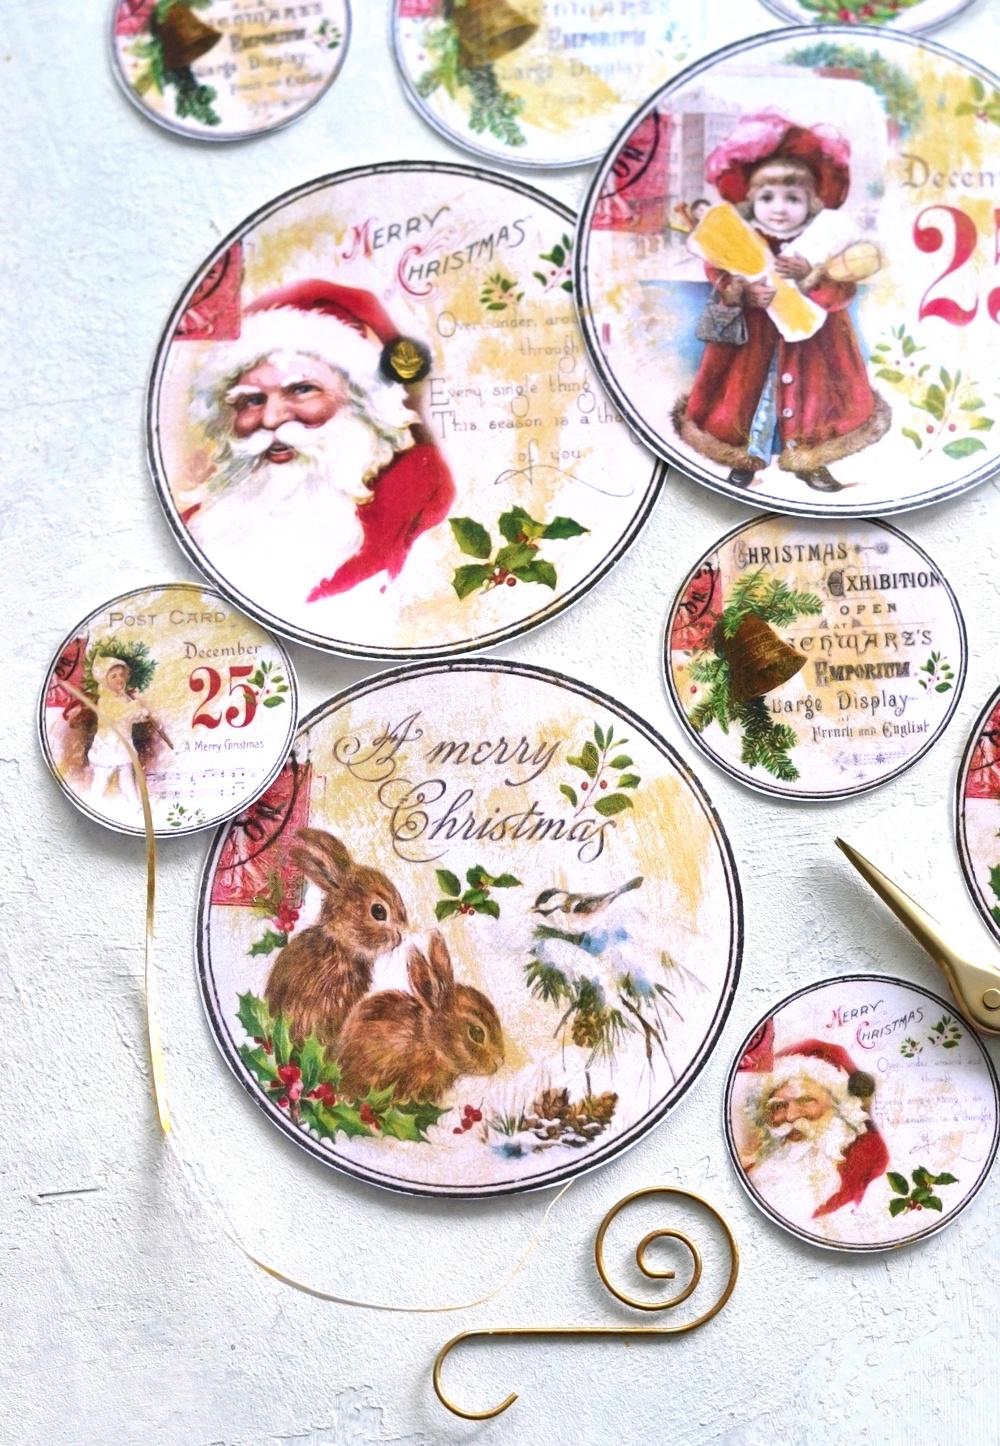 Diy Vintage Gold Christmas Gift Tags - Free Printable - Free Printable Vintage Christmas Tags For Gifts